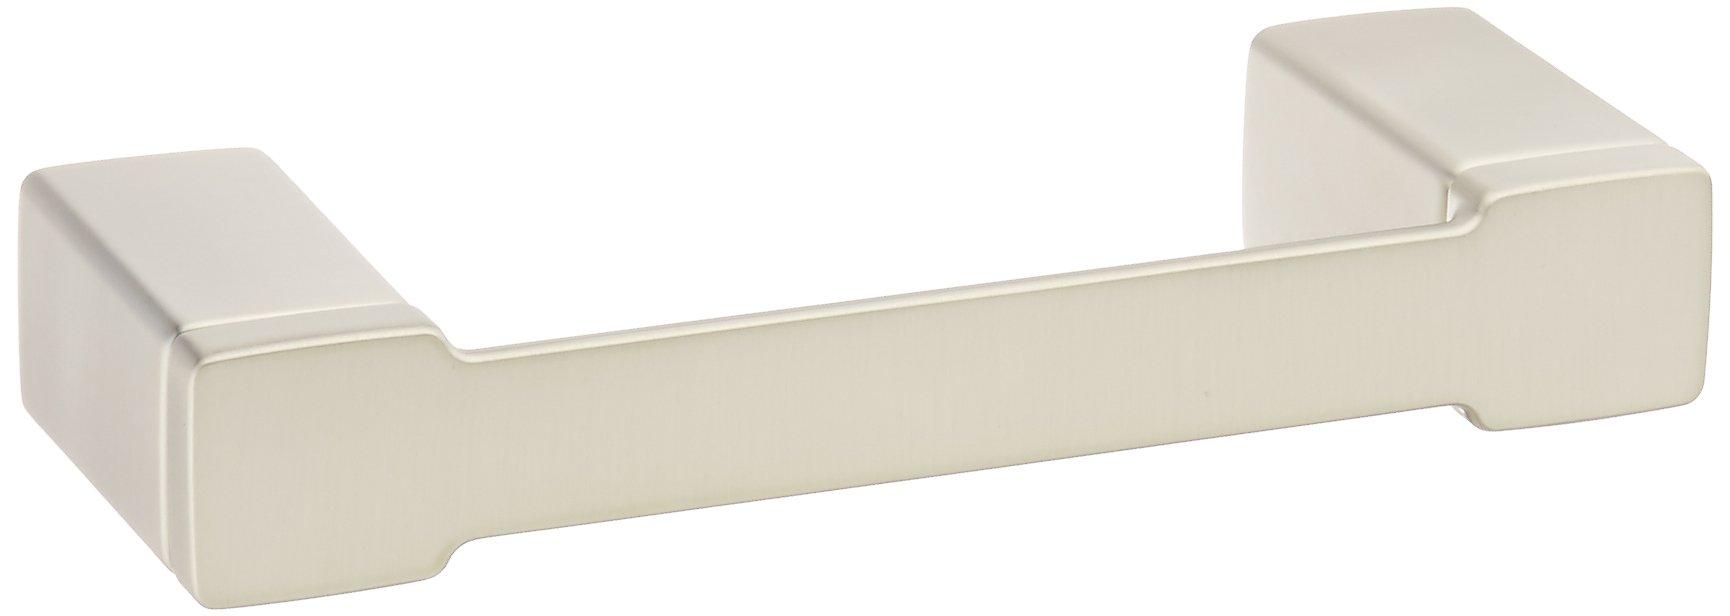 Moen YB8808BN 90 Degree Pivoting Toilet Paper Holder, Brushed Nickel